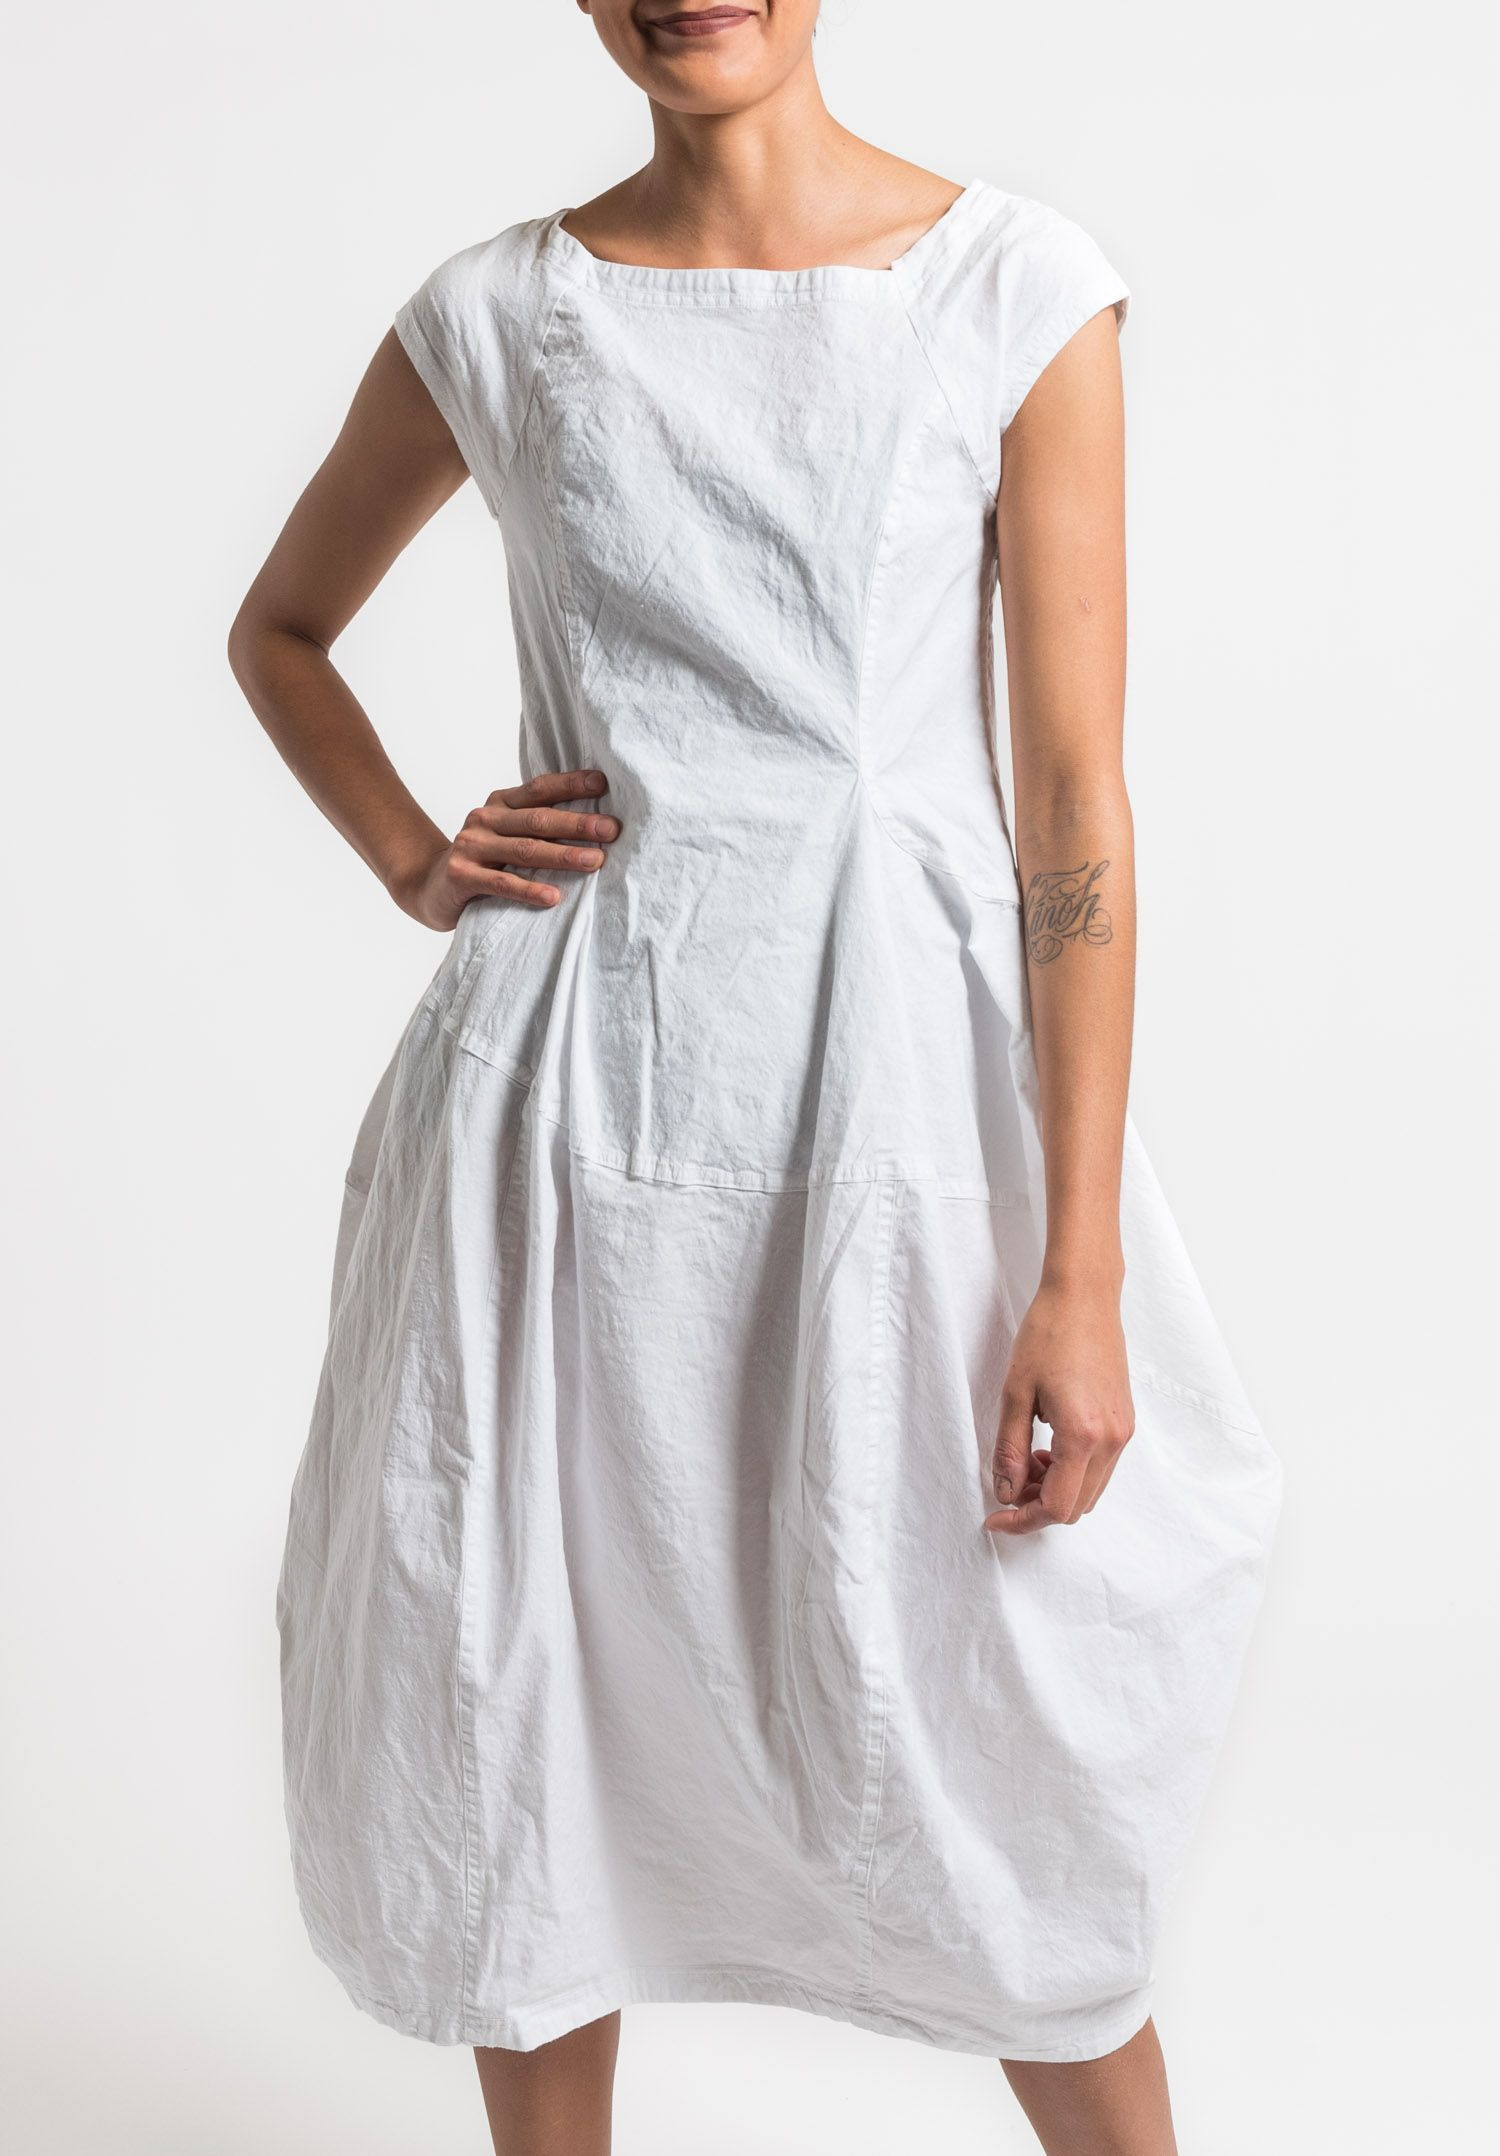 Rundholz Black Label Stretch Linen Tulip Dress In White Rundholz Black Label Clothes Tulip Dress [ 2156 x 1500 Pixel ]